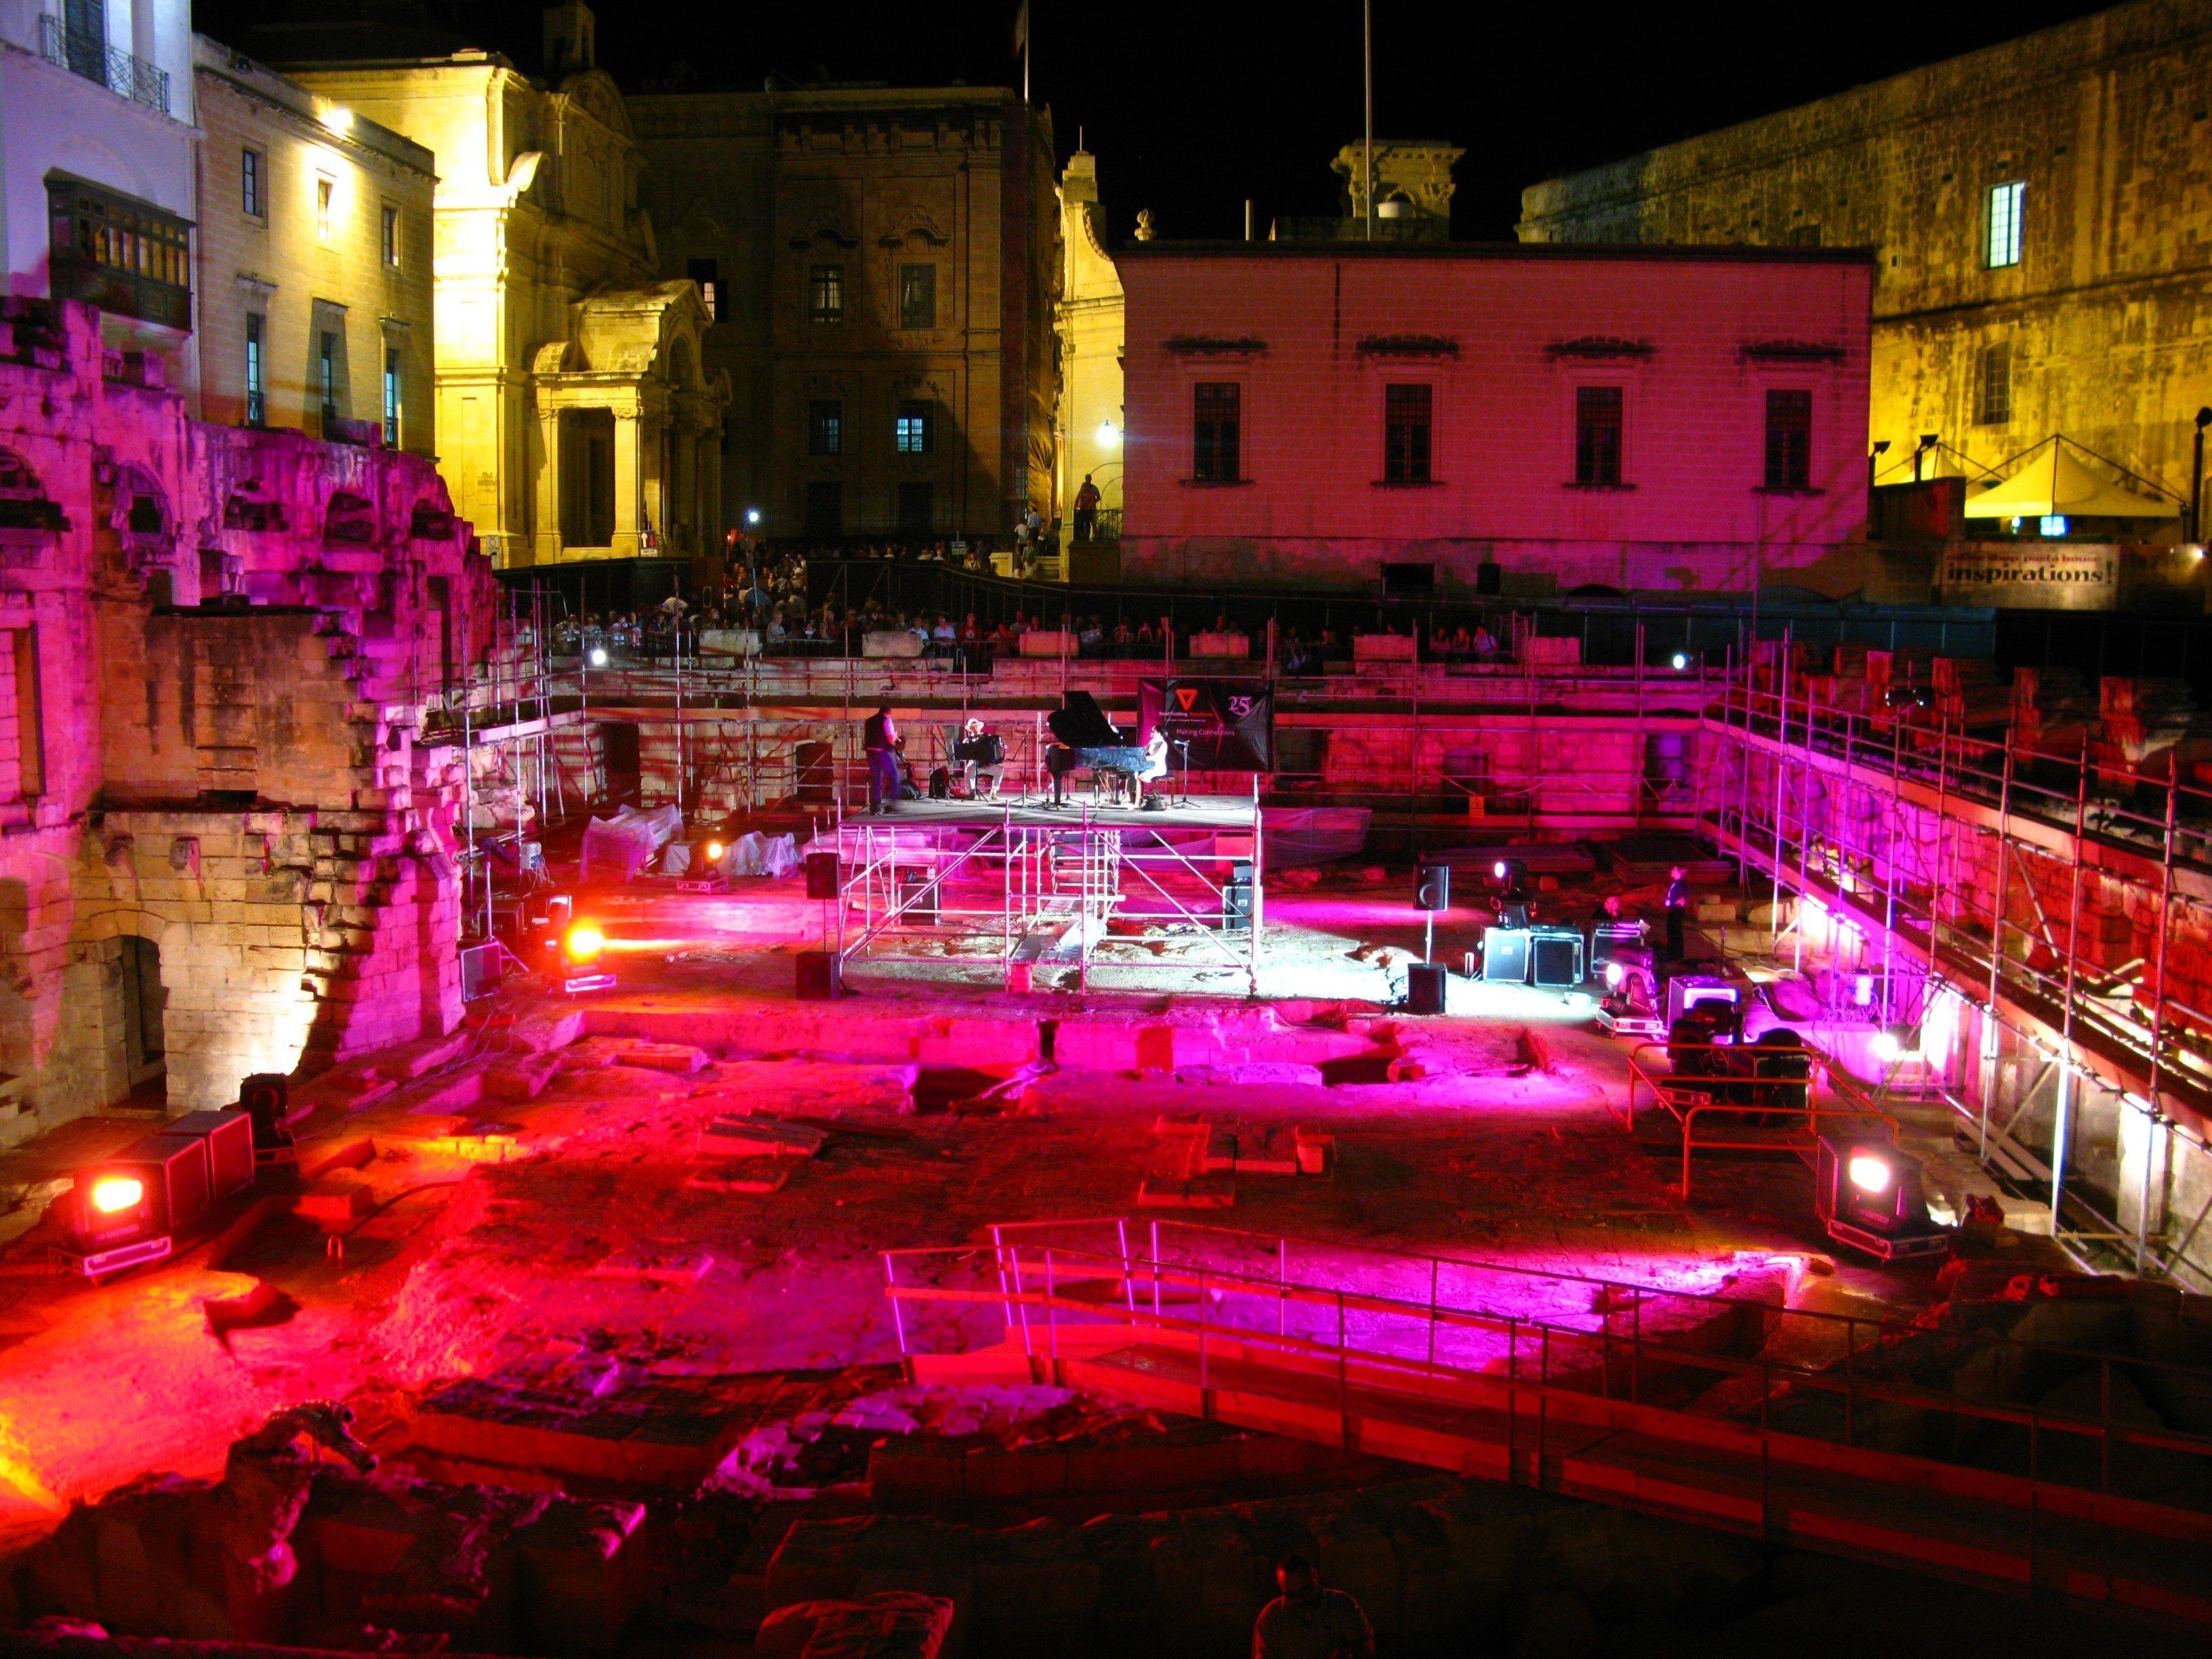 Notte Bianca, Lejl Imdawwal, white night, Maltese festivals, Valetta